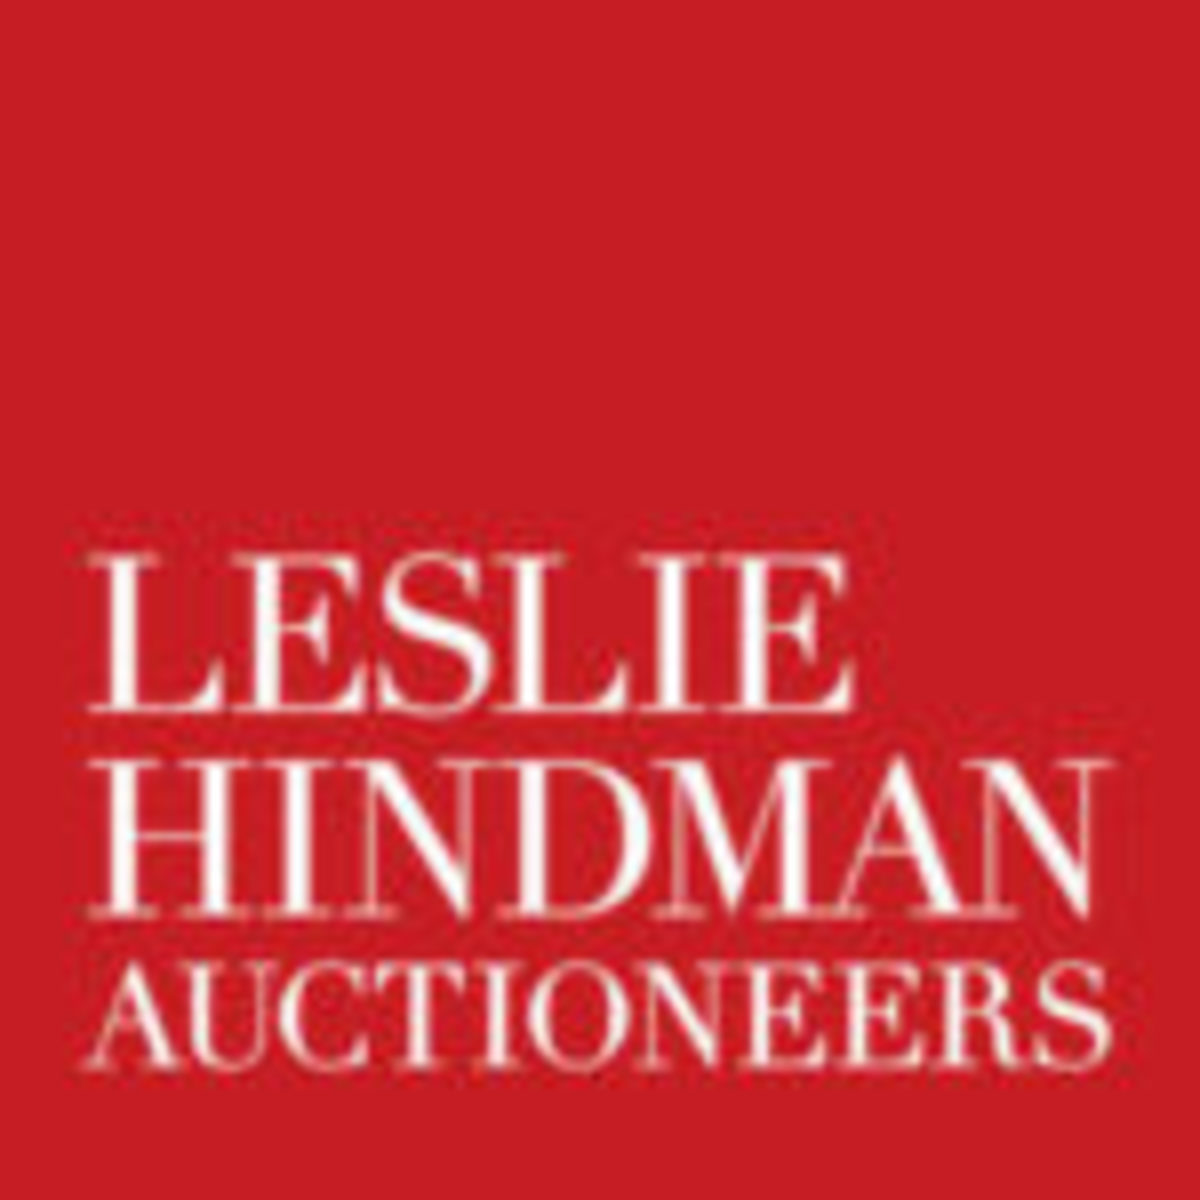 Leslie Hindman Auctioneers, www.lesliehindman.com